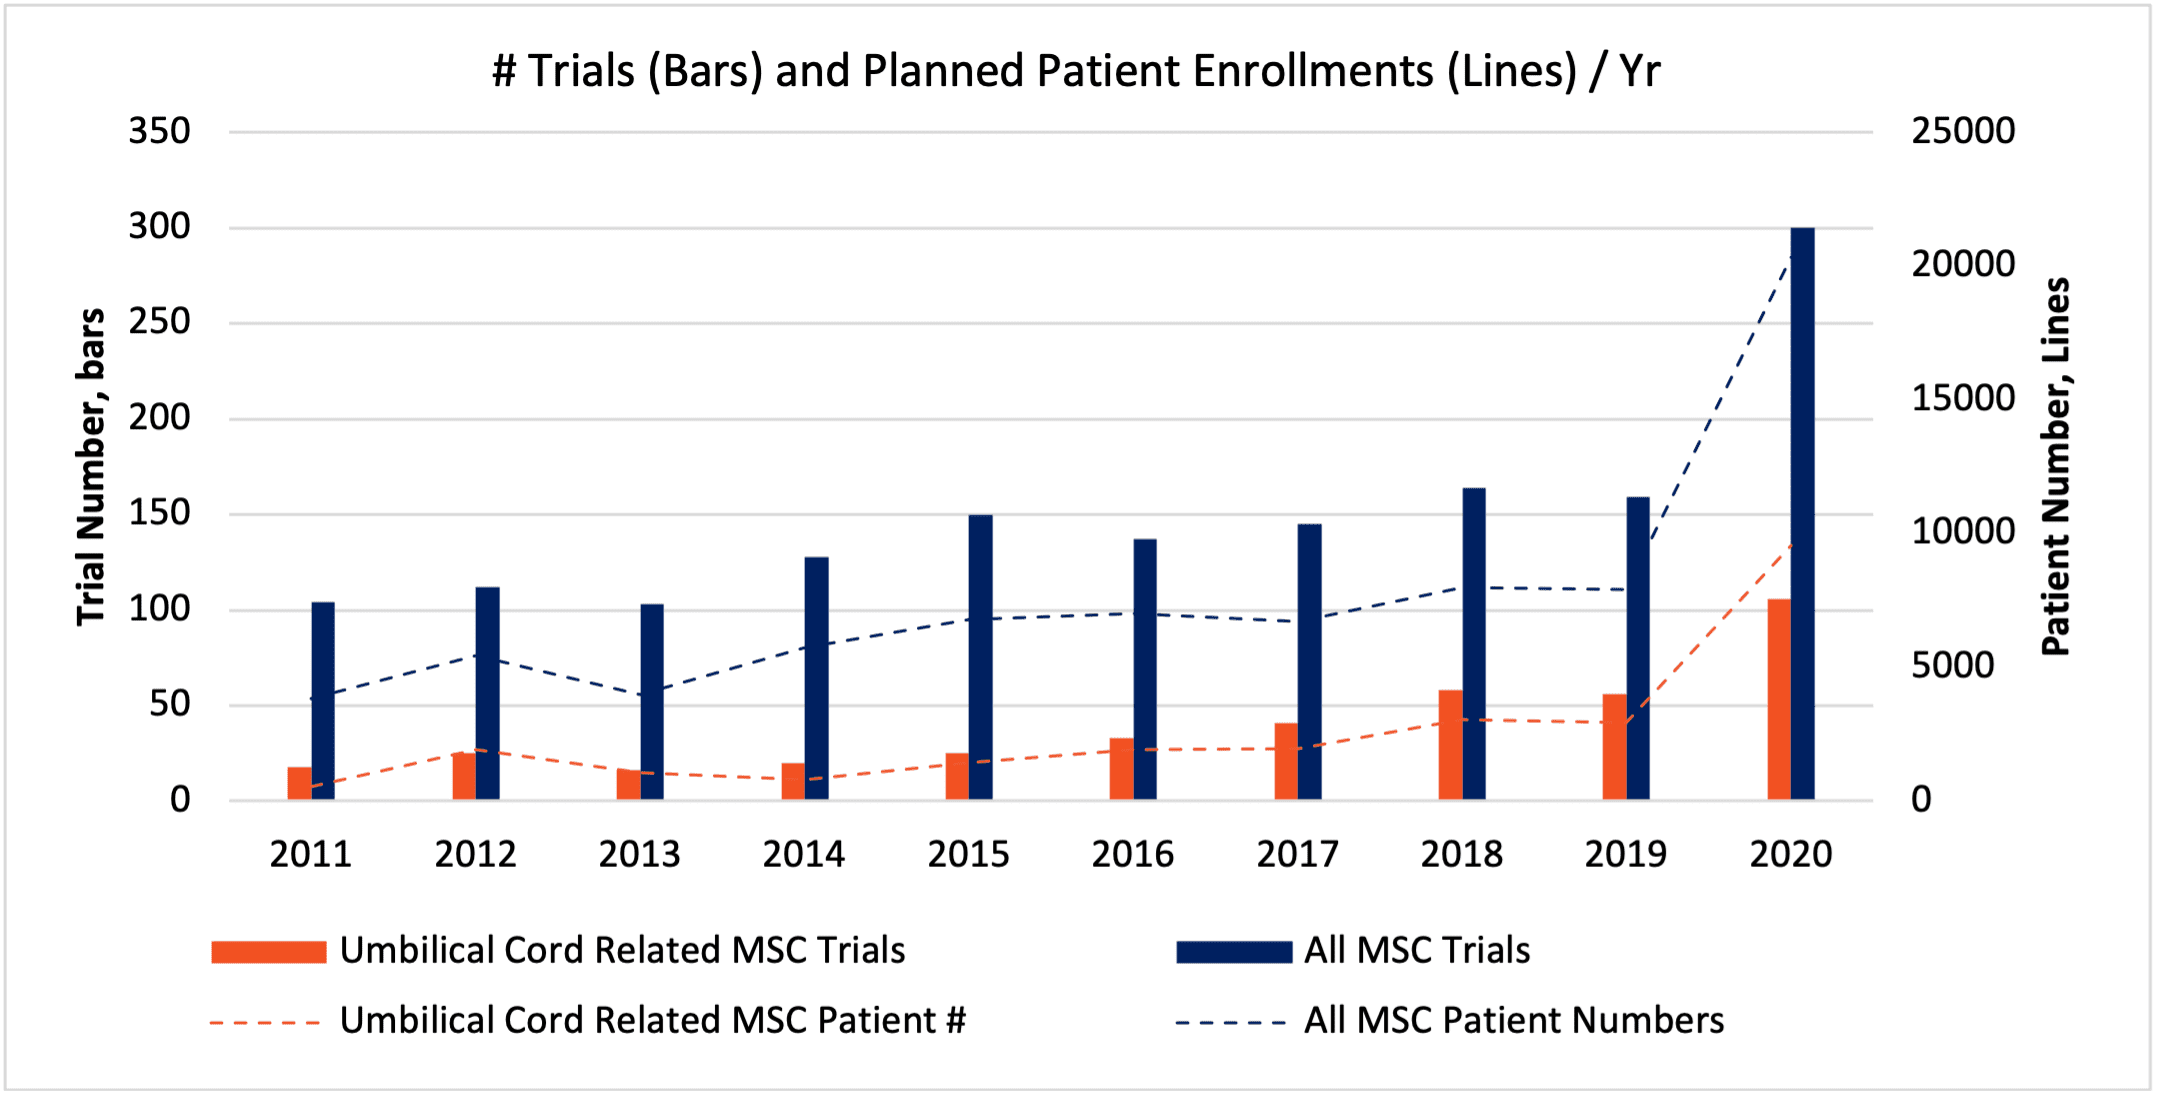 umbilical cord tissues MSC trials and patient